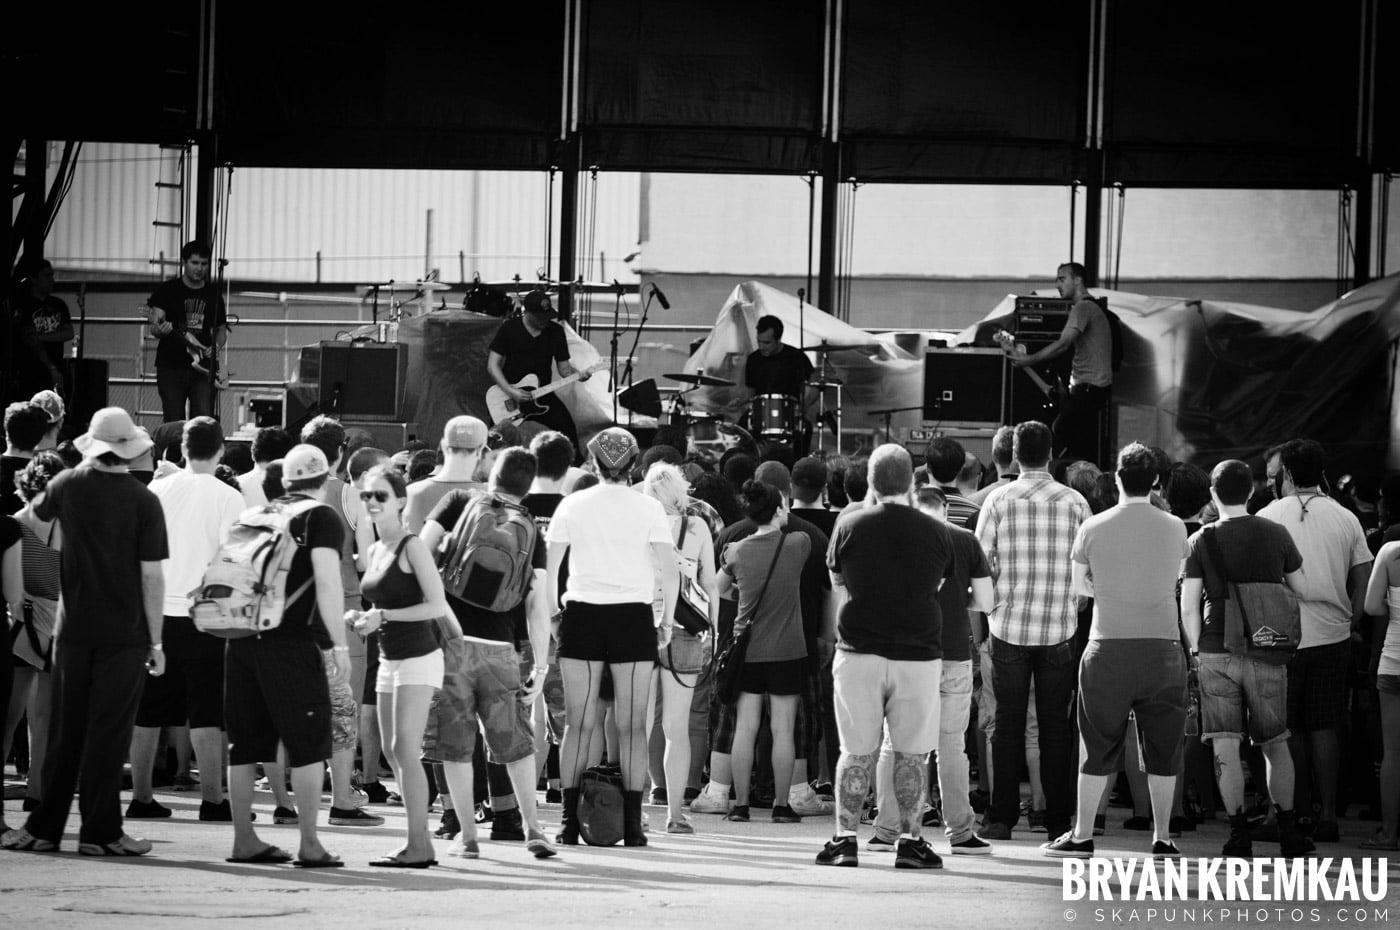 The Menzingers @ Riot Fest 2012, Williamsburg Park NY - 9.8.12 (1)